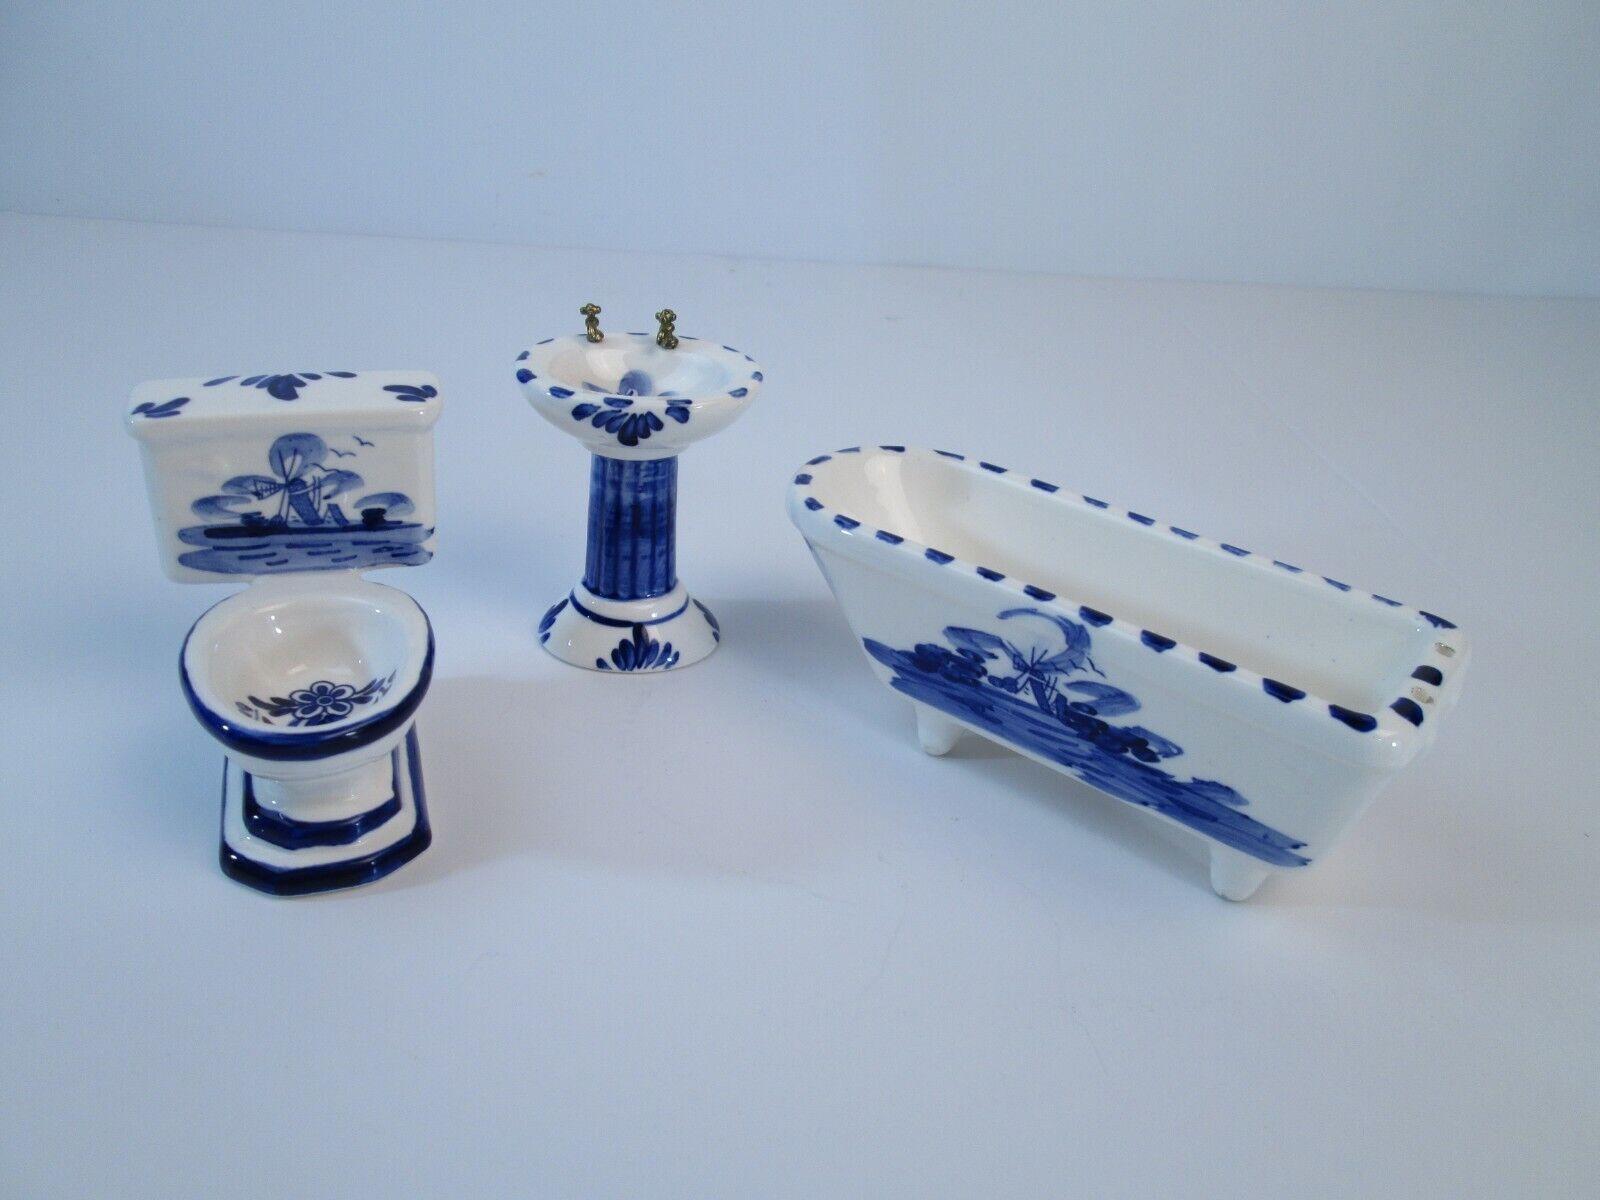 Vintage Hepainted blu Delft Bathroom Set bambolahouse 1 12  Scale Miniature  essere molto richiesto